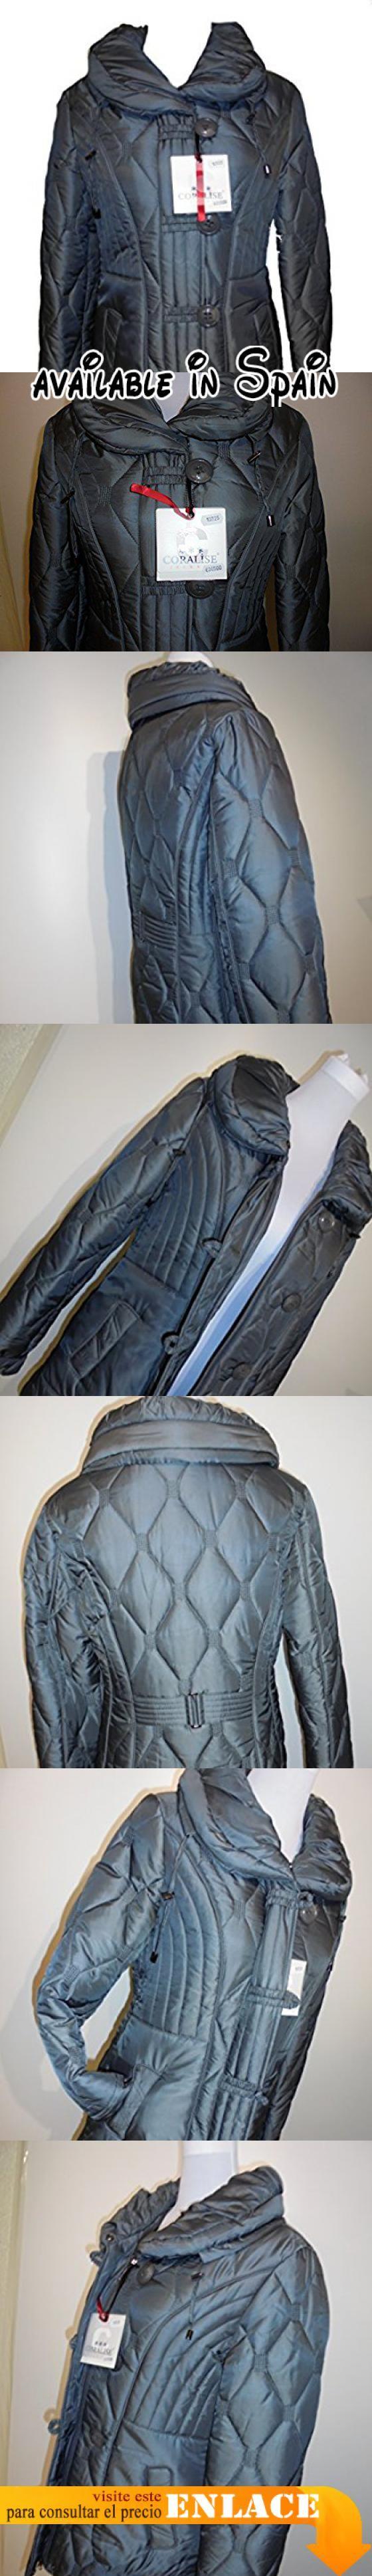 B015HGLGO0 : CORALISE - Abrigo impermeable - Manga larga - para mujer gris Medium.